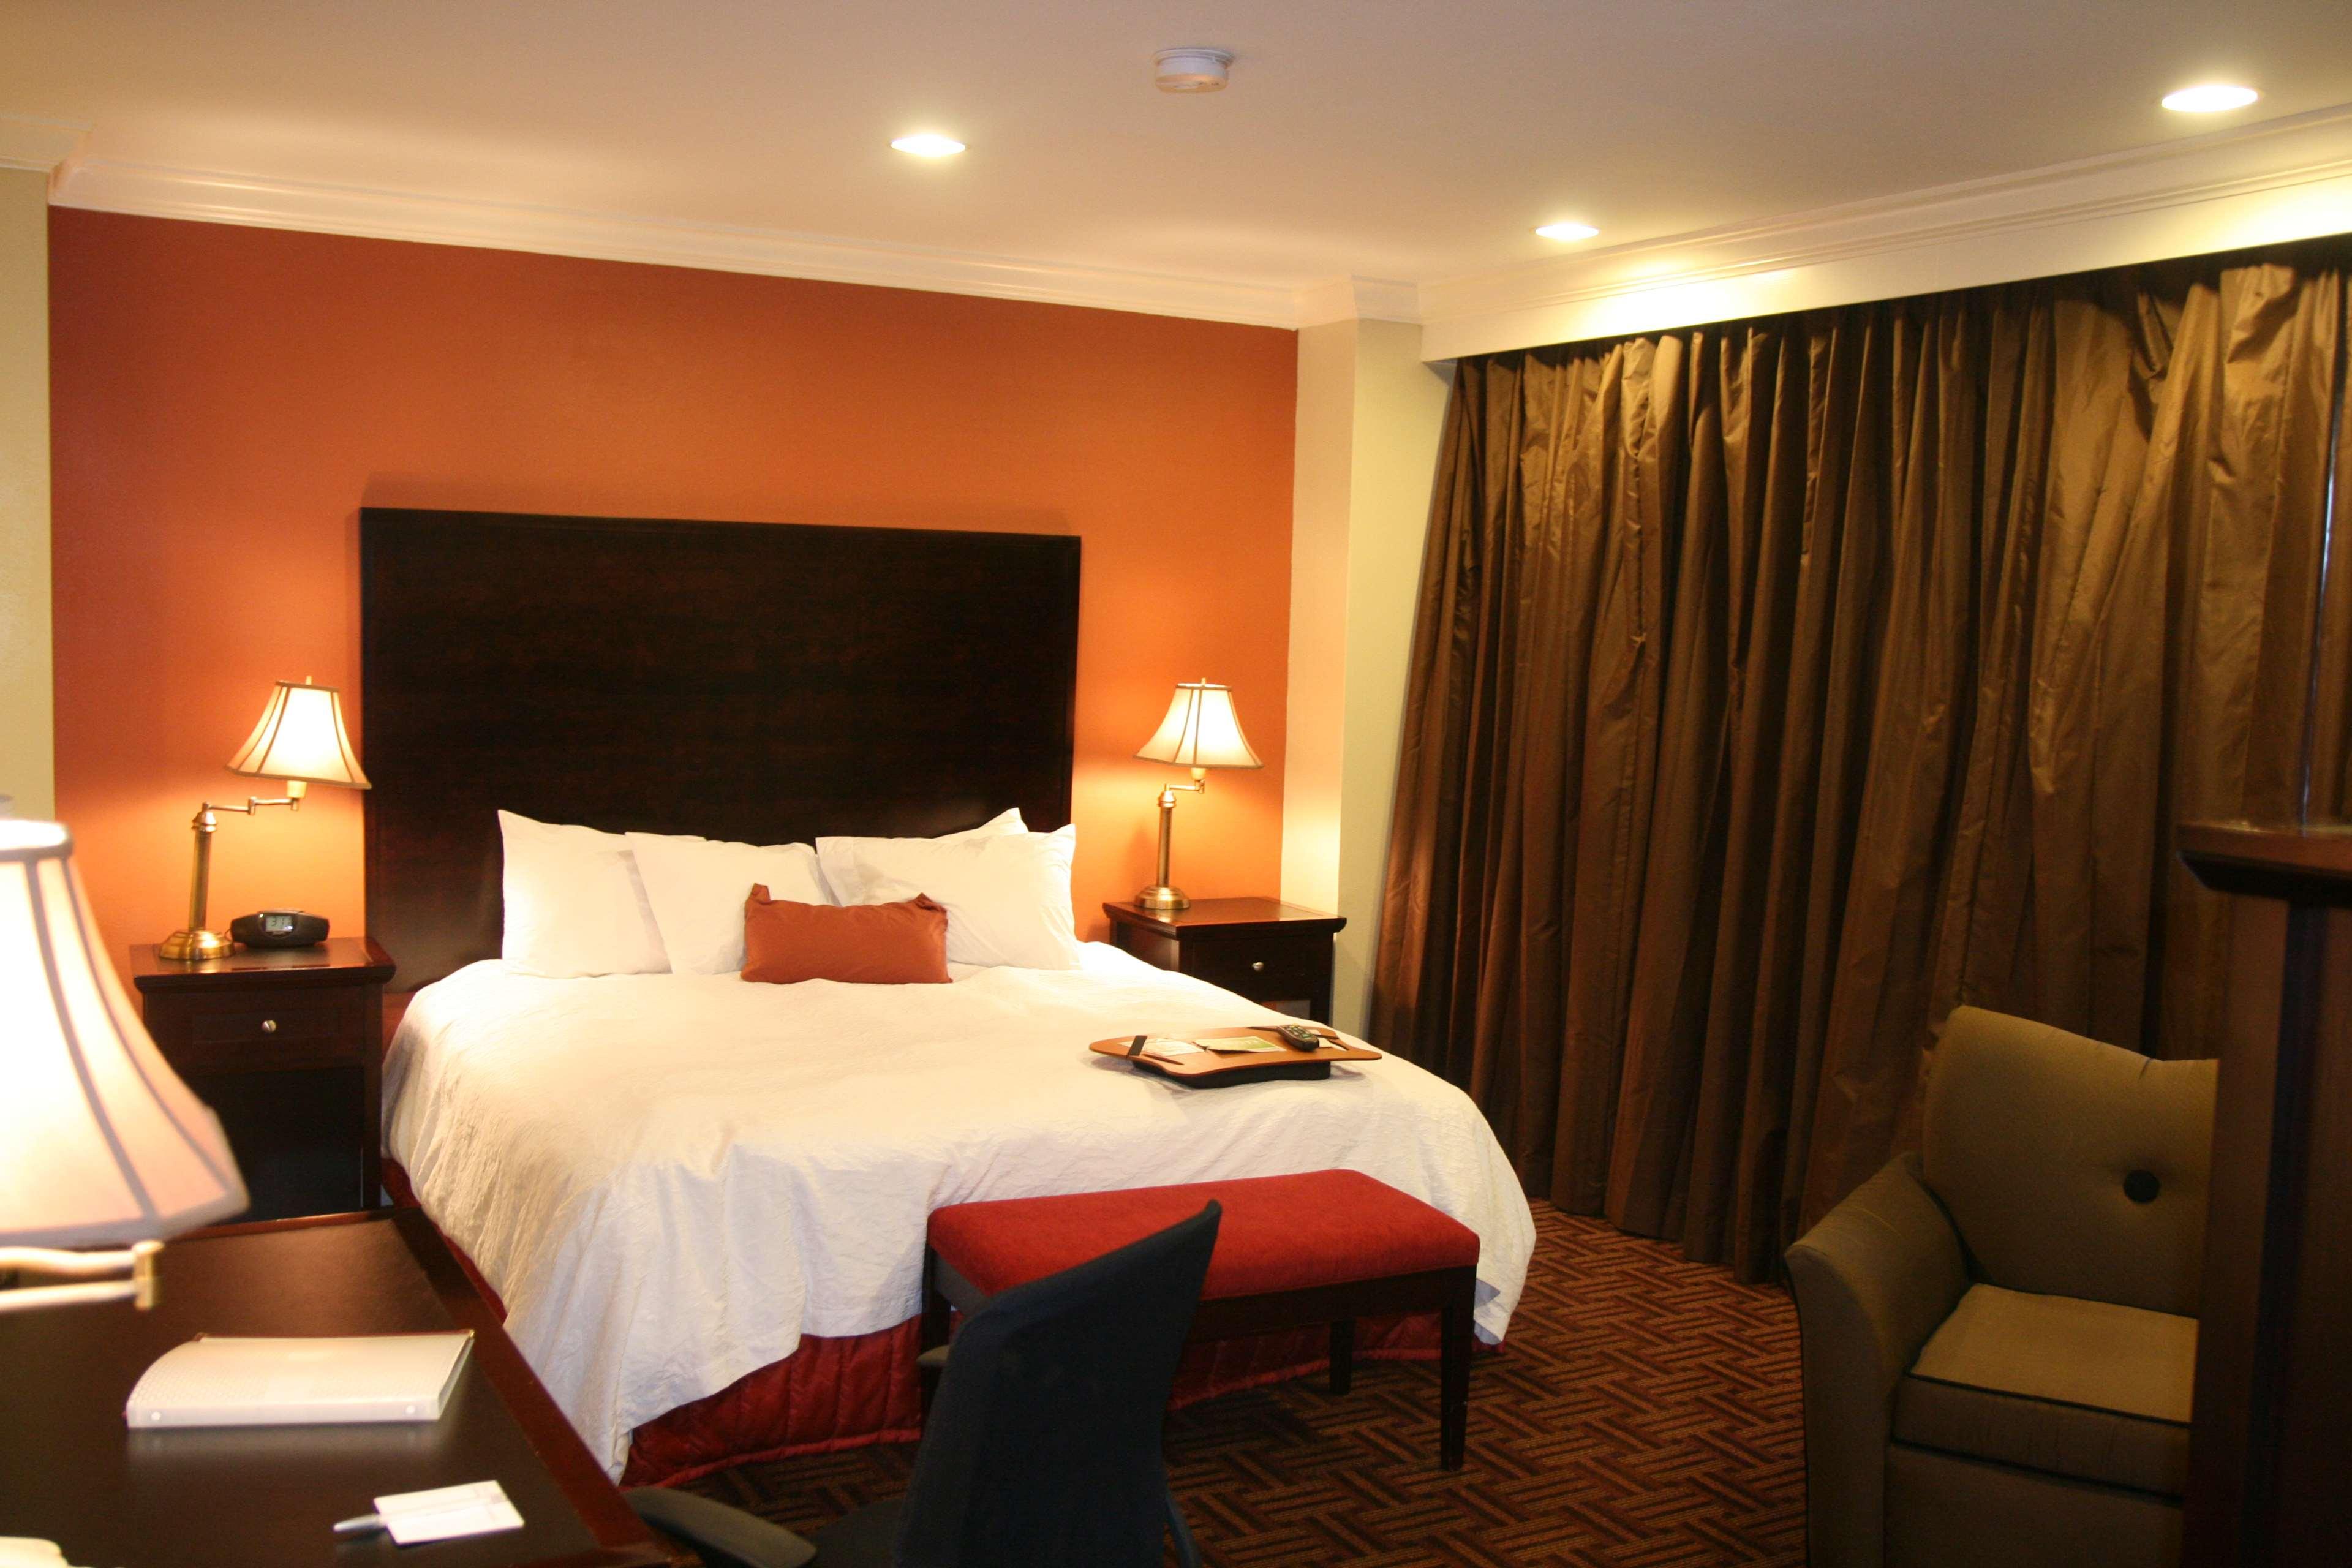 Hampton Inn & Suites Stamford image 18